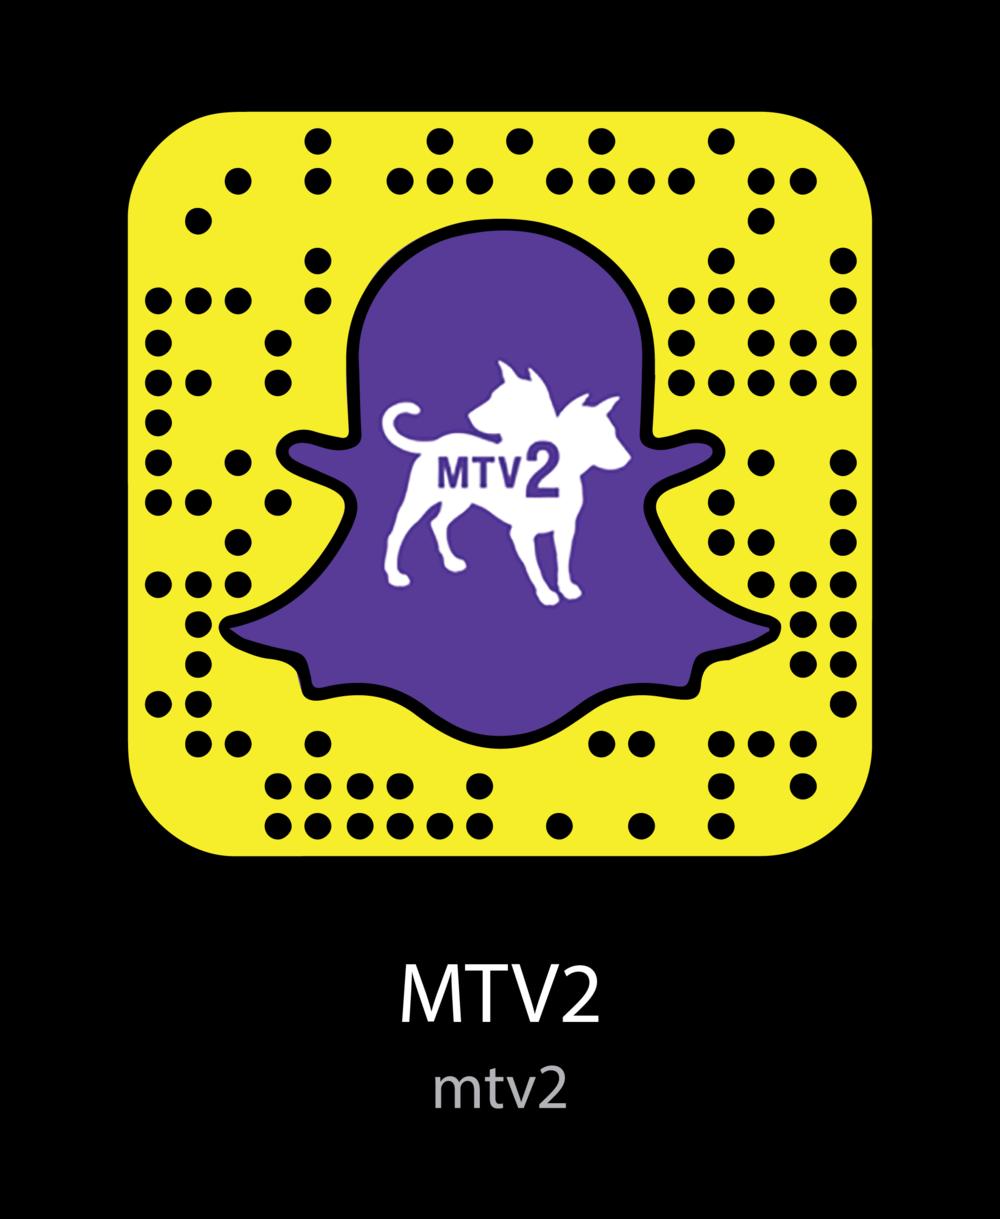 mtv2-Brands-snapchat-snapcode.png